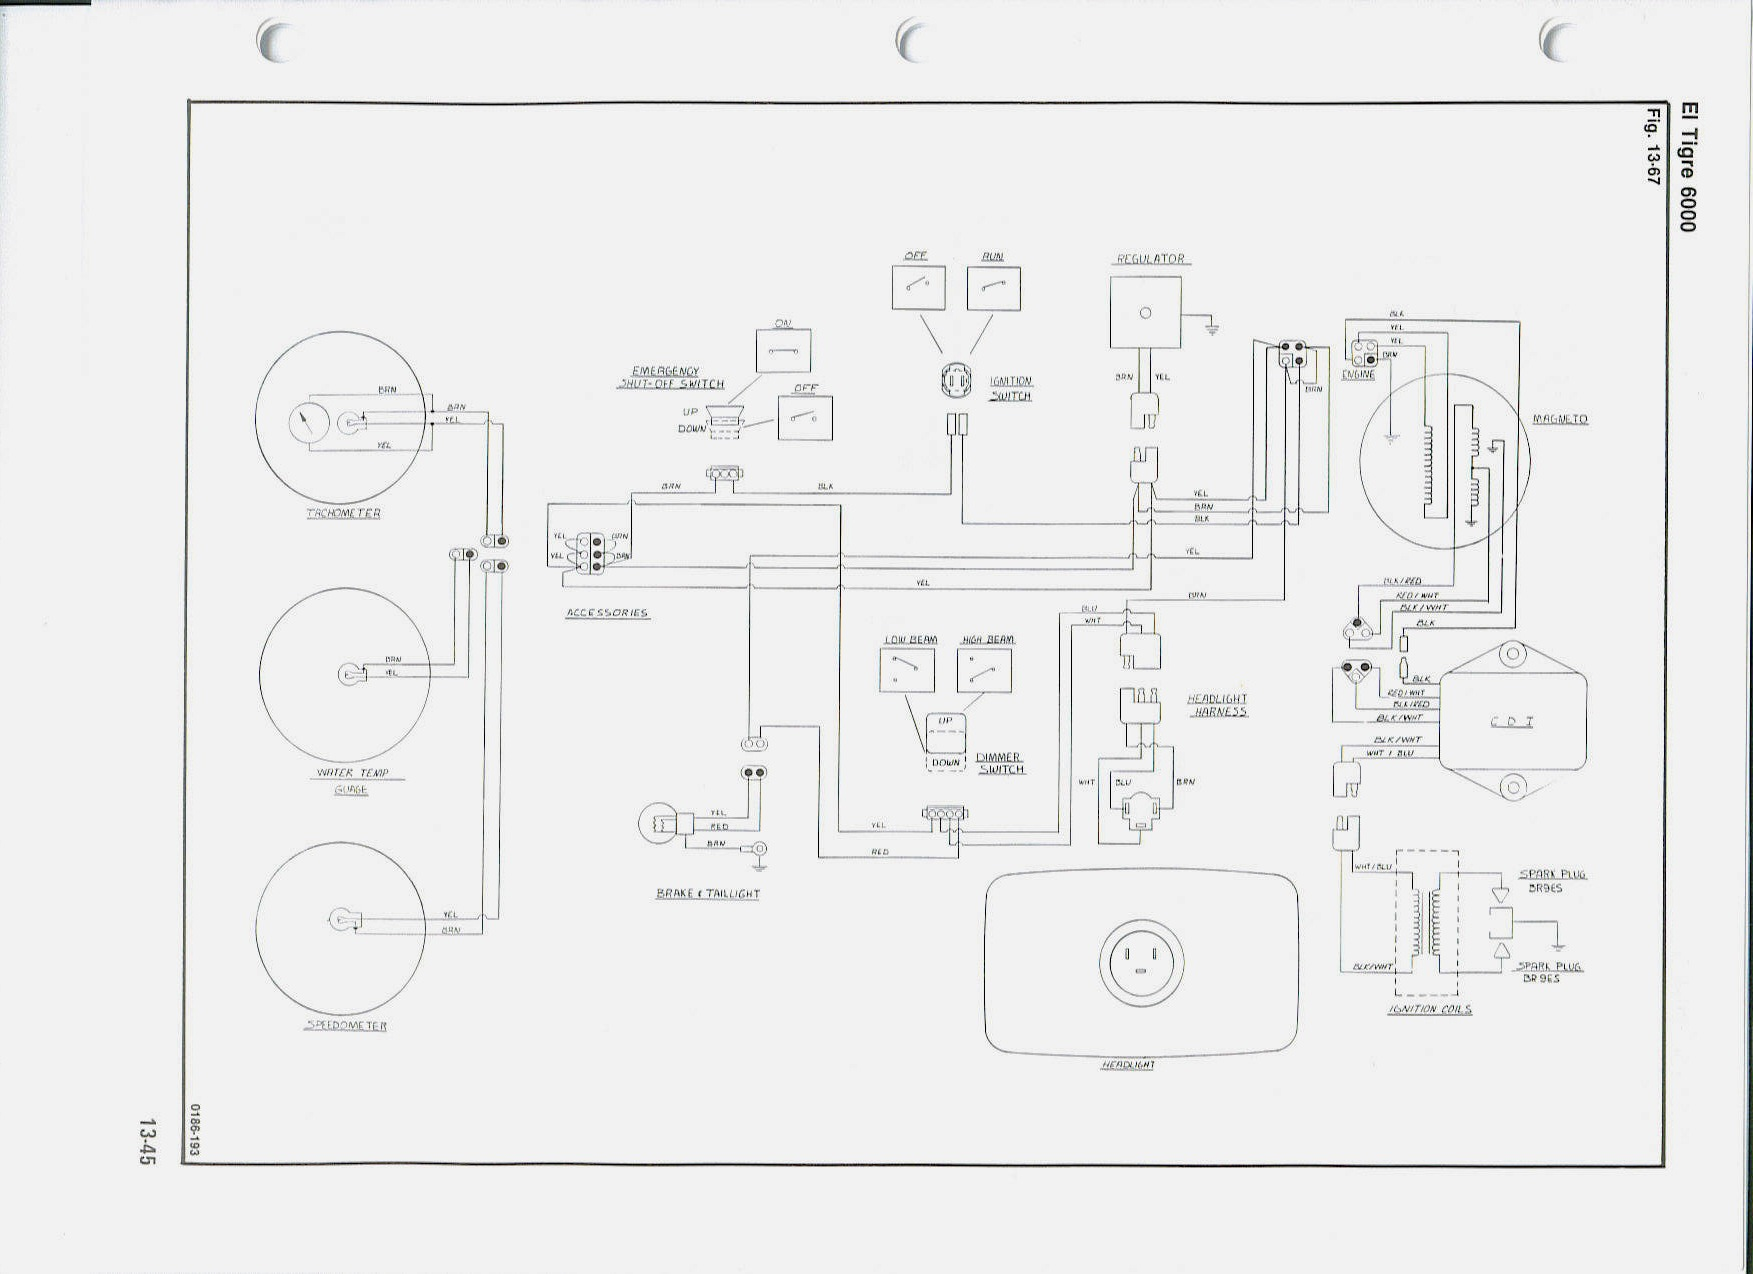 Yamaha Enticer 340 Wiring